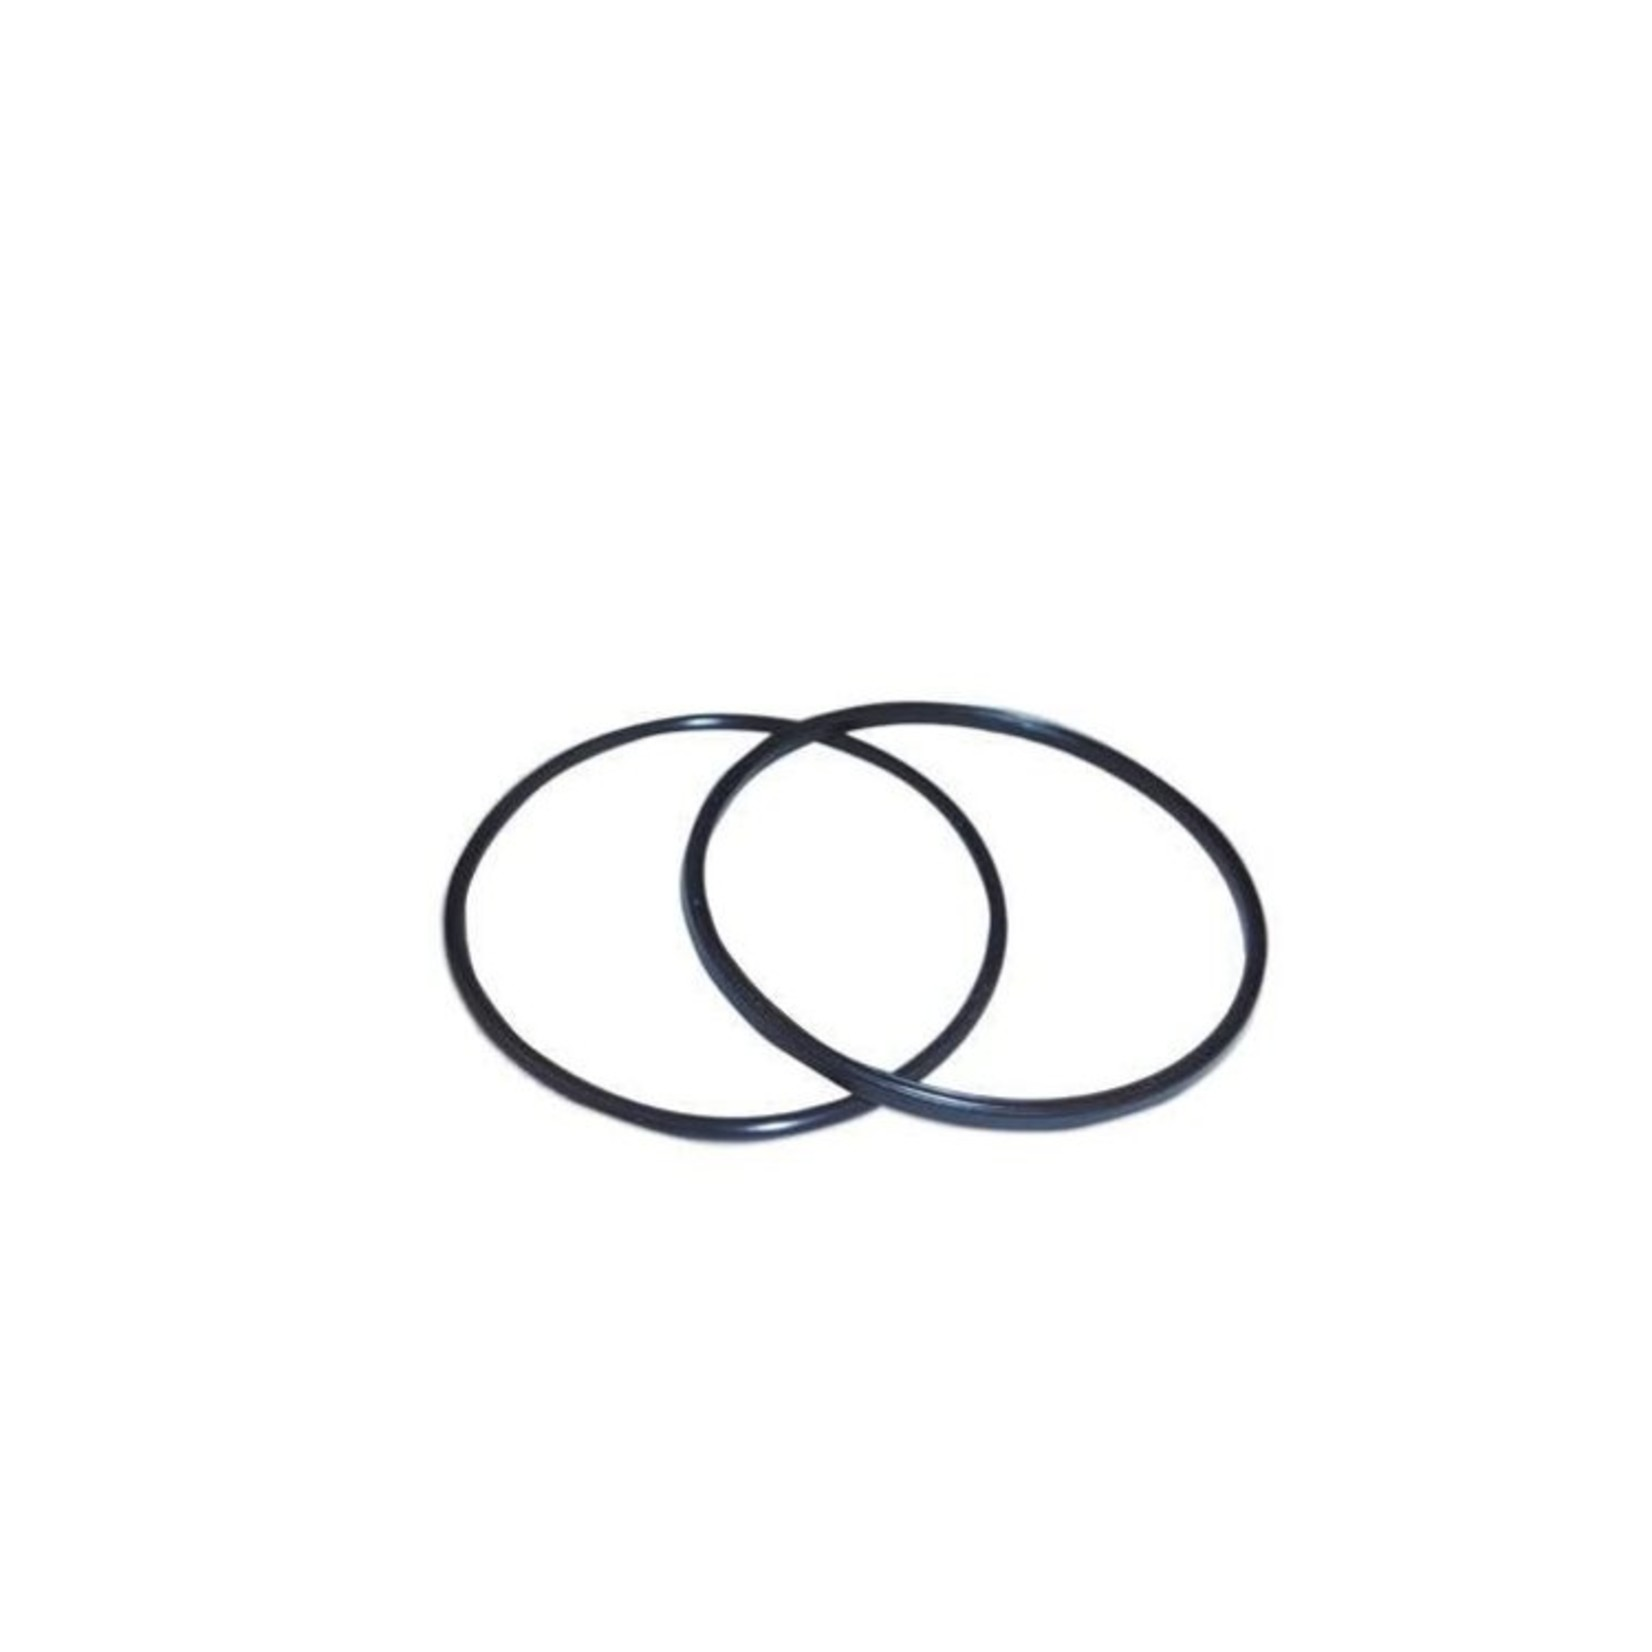 Sealife O-ring set for Sea Dragon Flash SL963